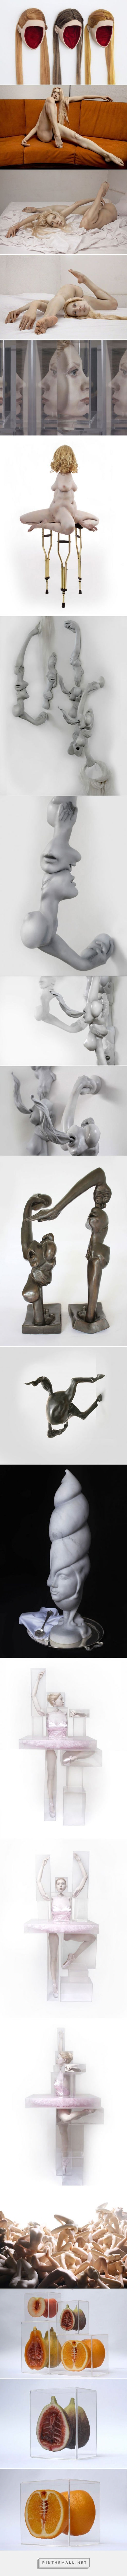 Monica Piloni's Sculptural Horror